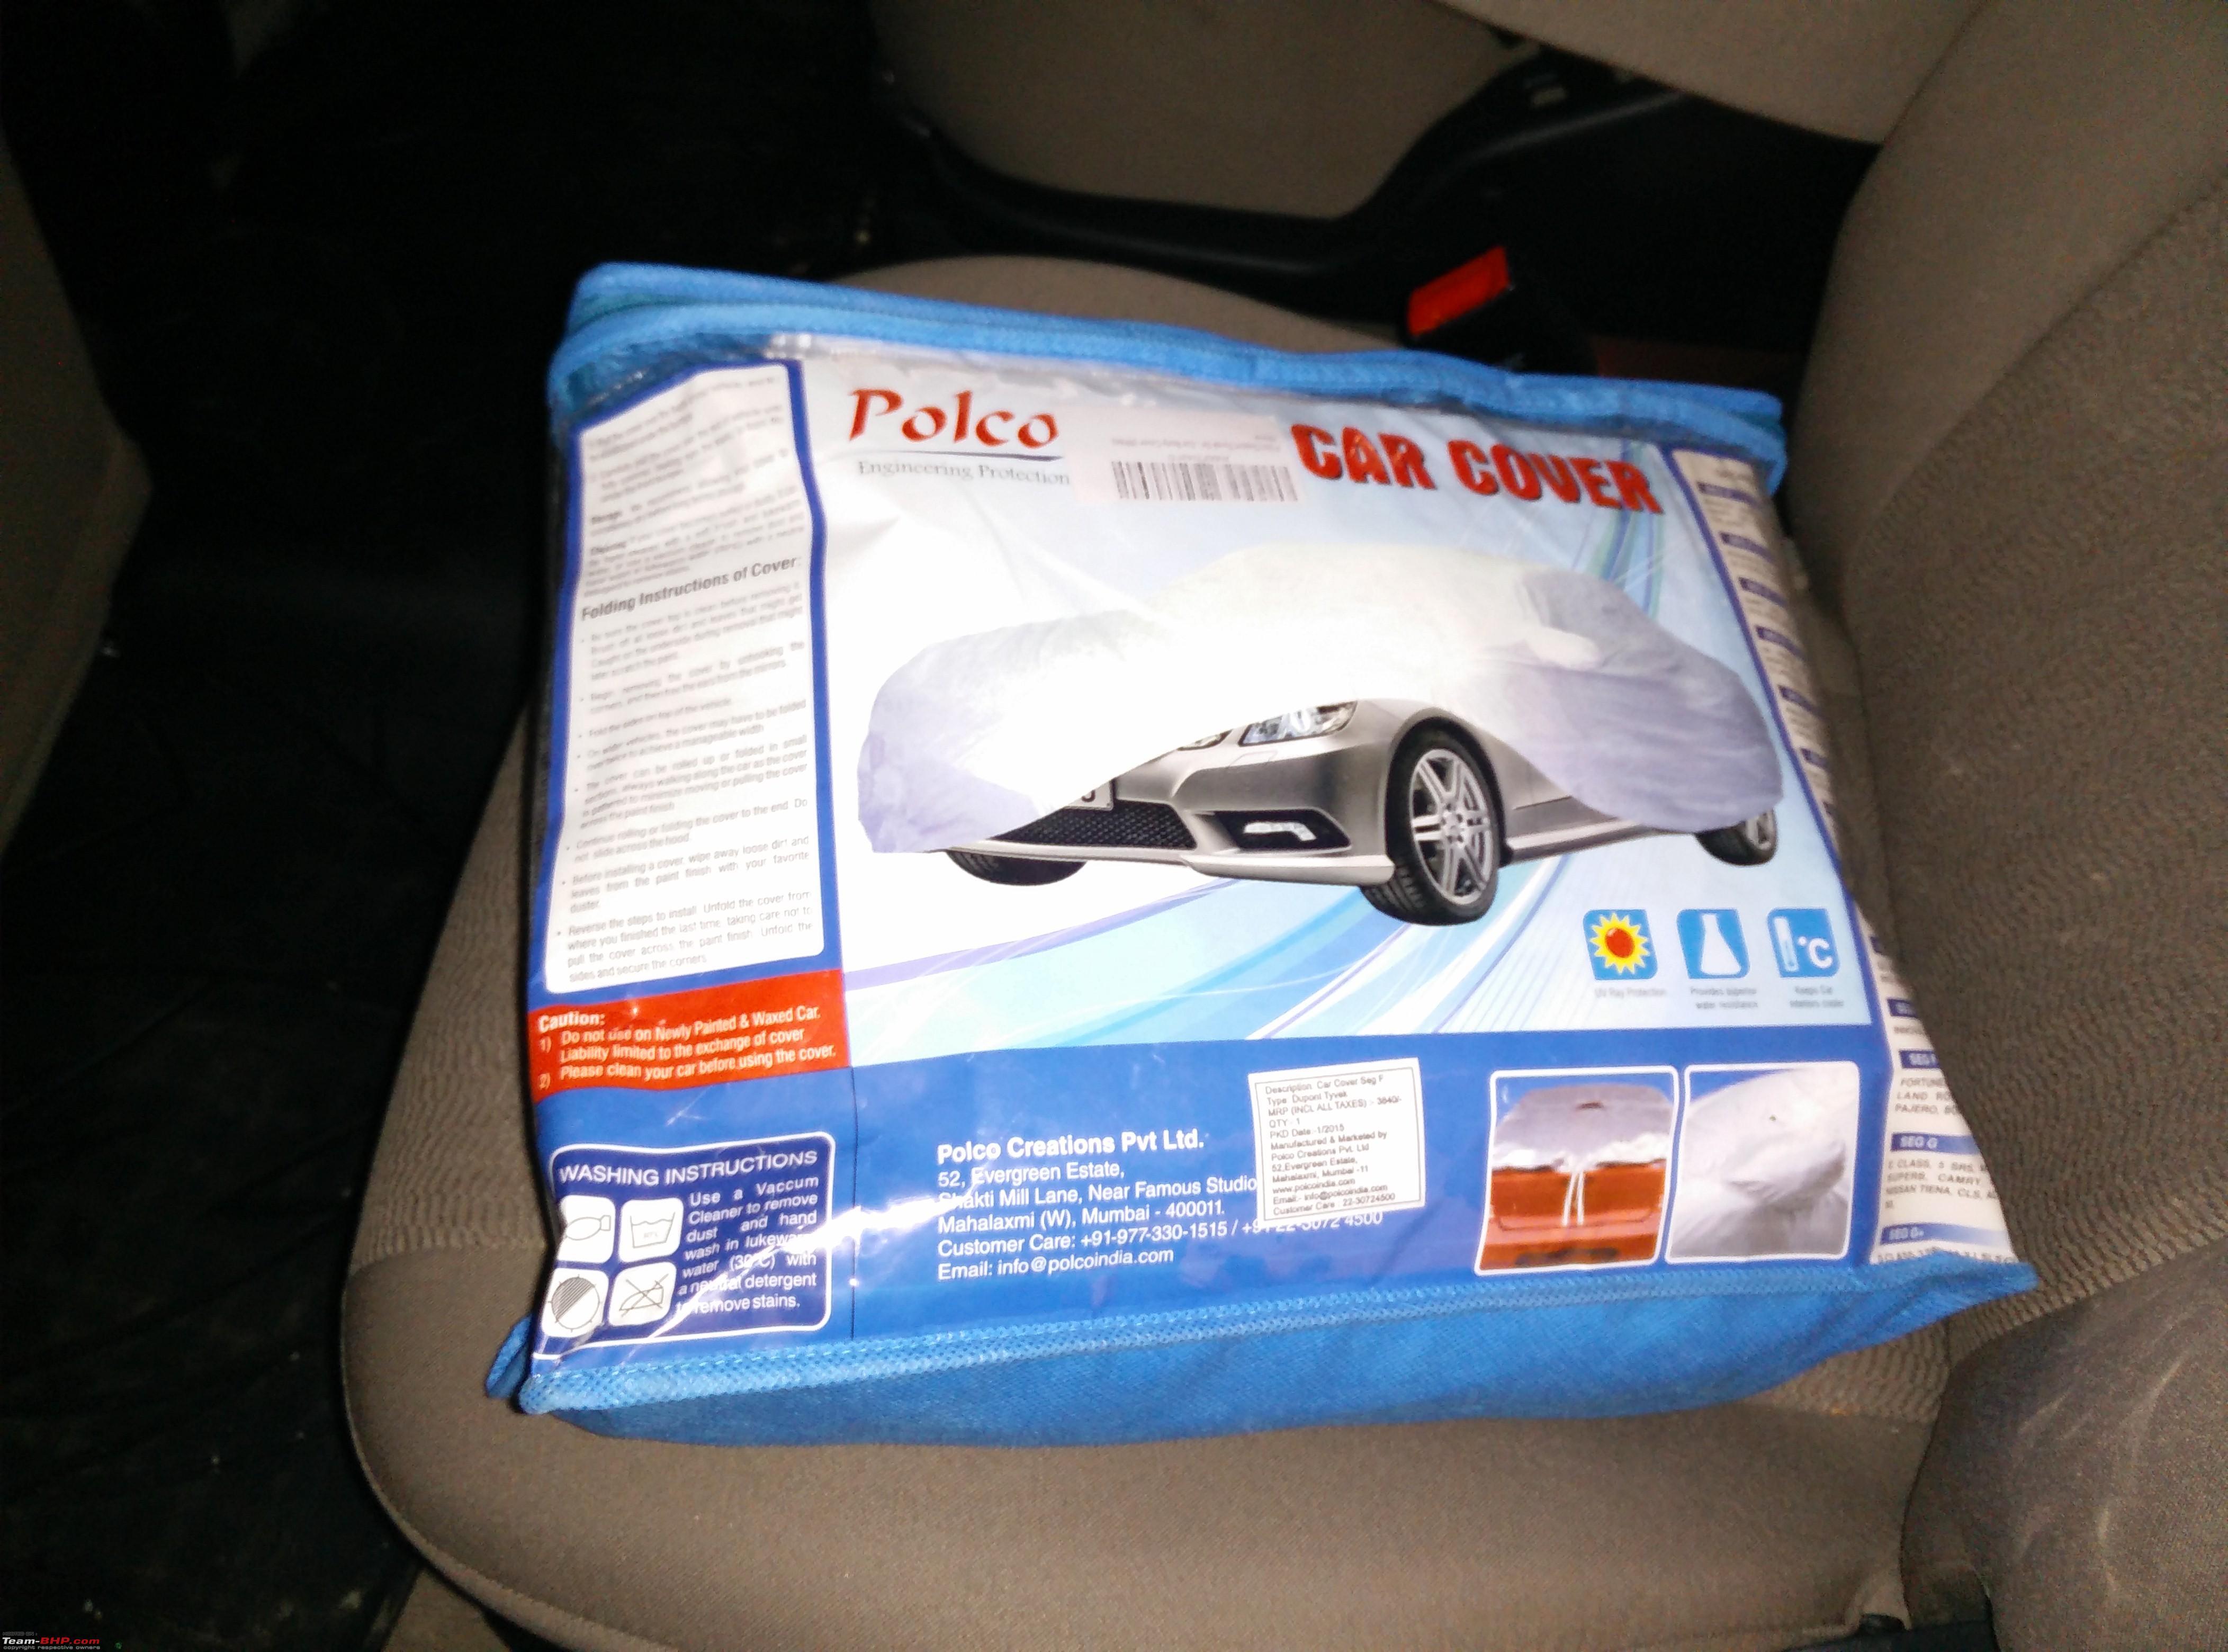 Polco Dupont Tyvek Car Cover